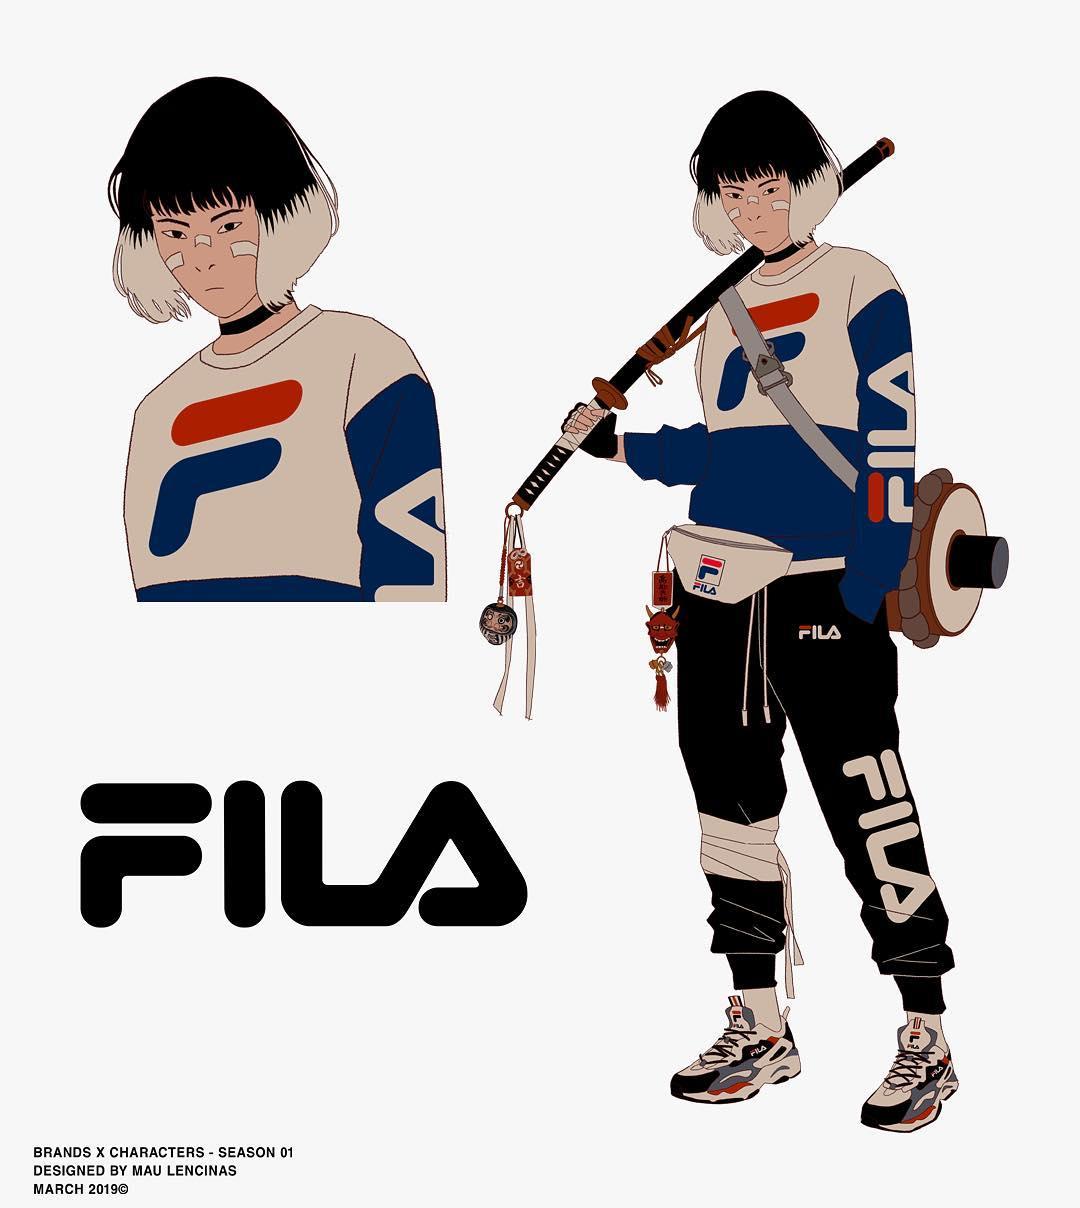 Sufijo aliviar Incomodidad  Mau Lencinas (@mau.lencinas) · Instagram 照片和视频 | Anime character design,  Character design, Concept art characters